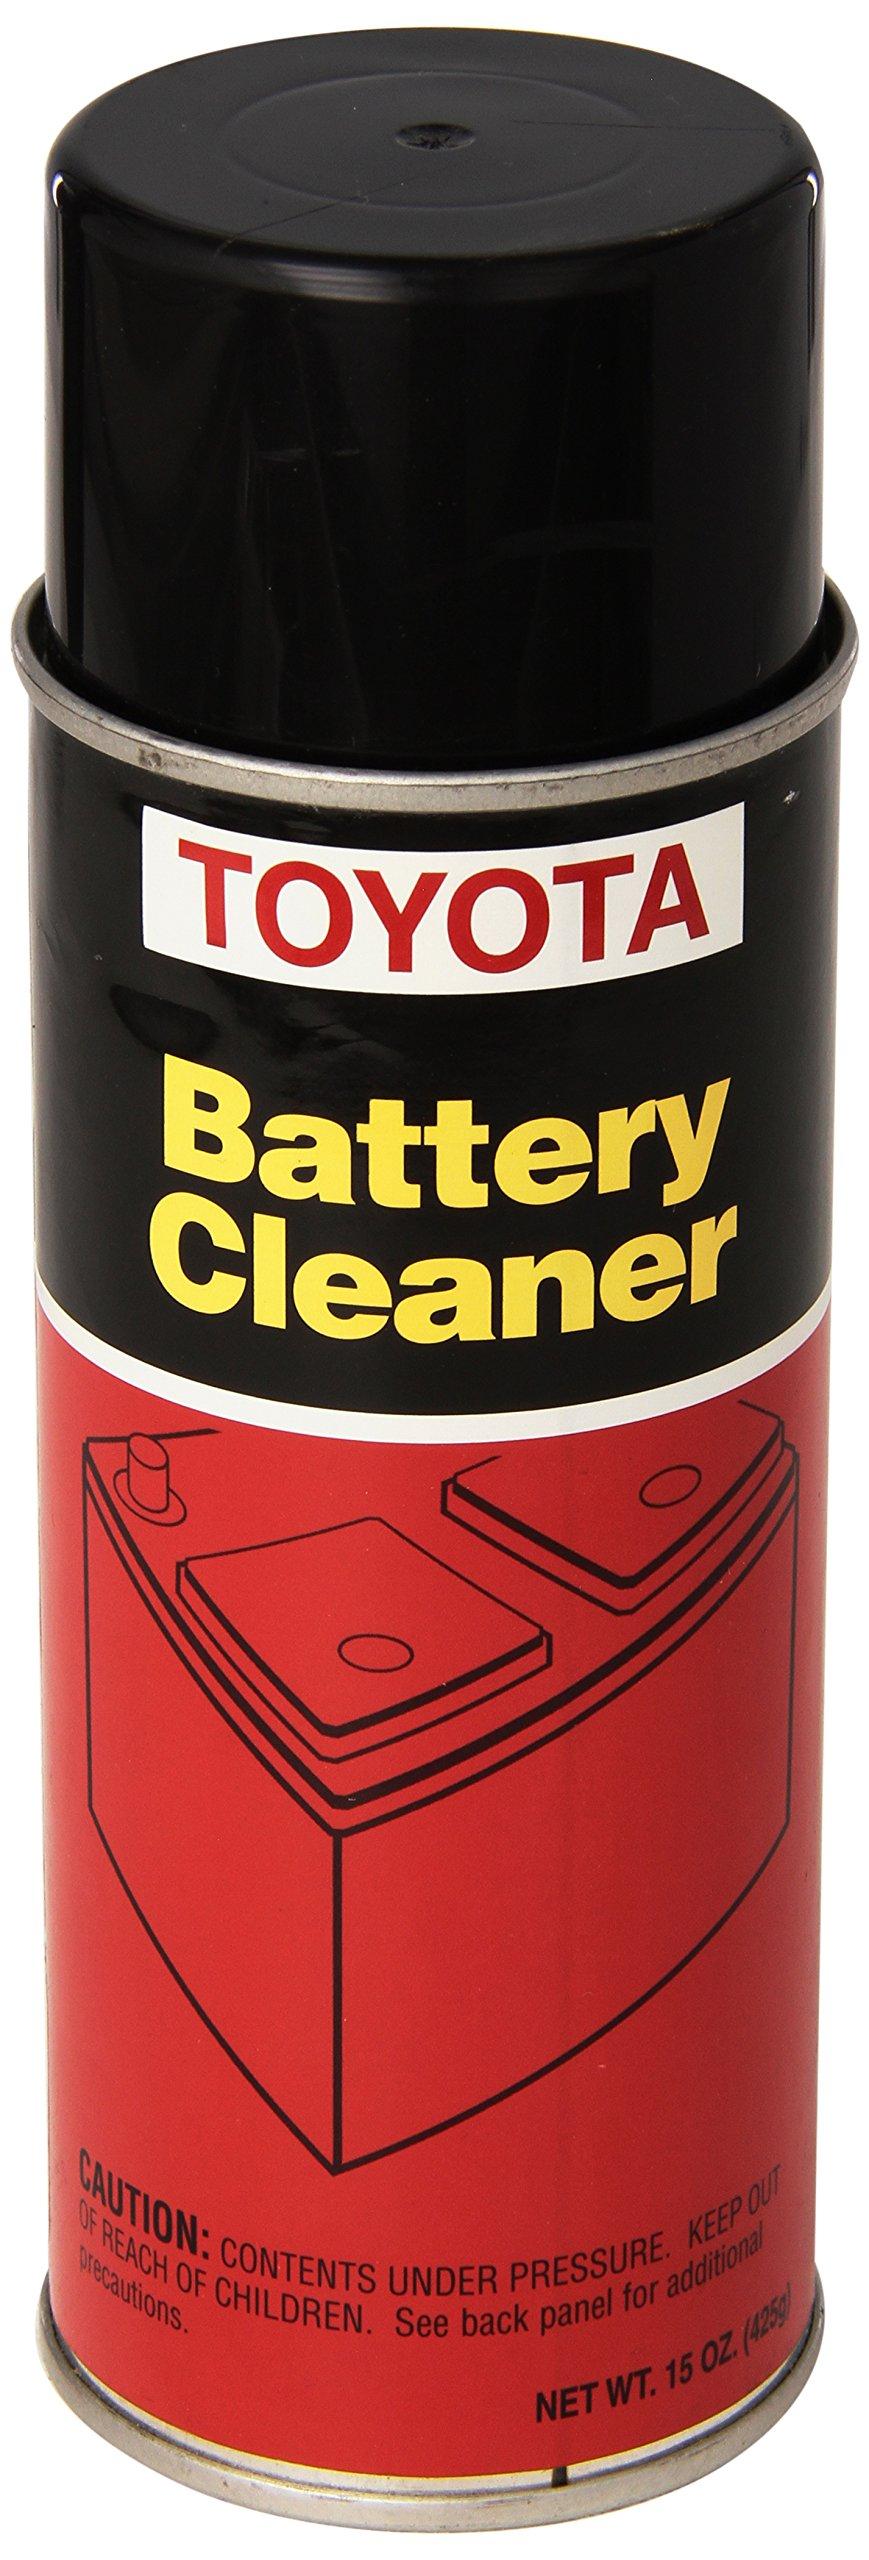 Toyota Genuine Fluid 00289-BTC00 Battery Cleaner - 15 oz. Can